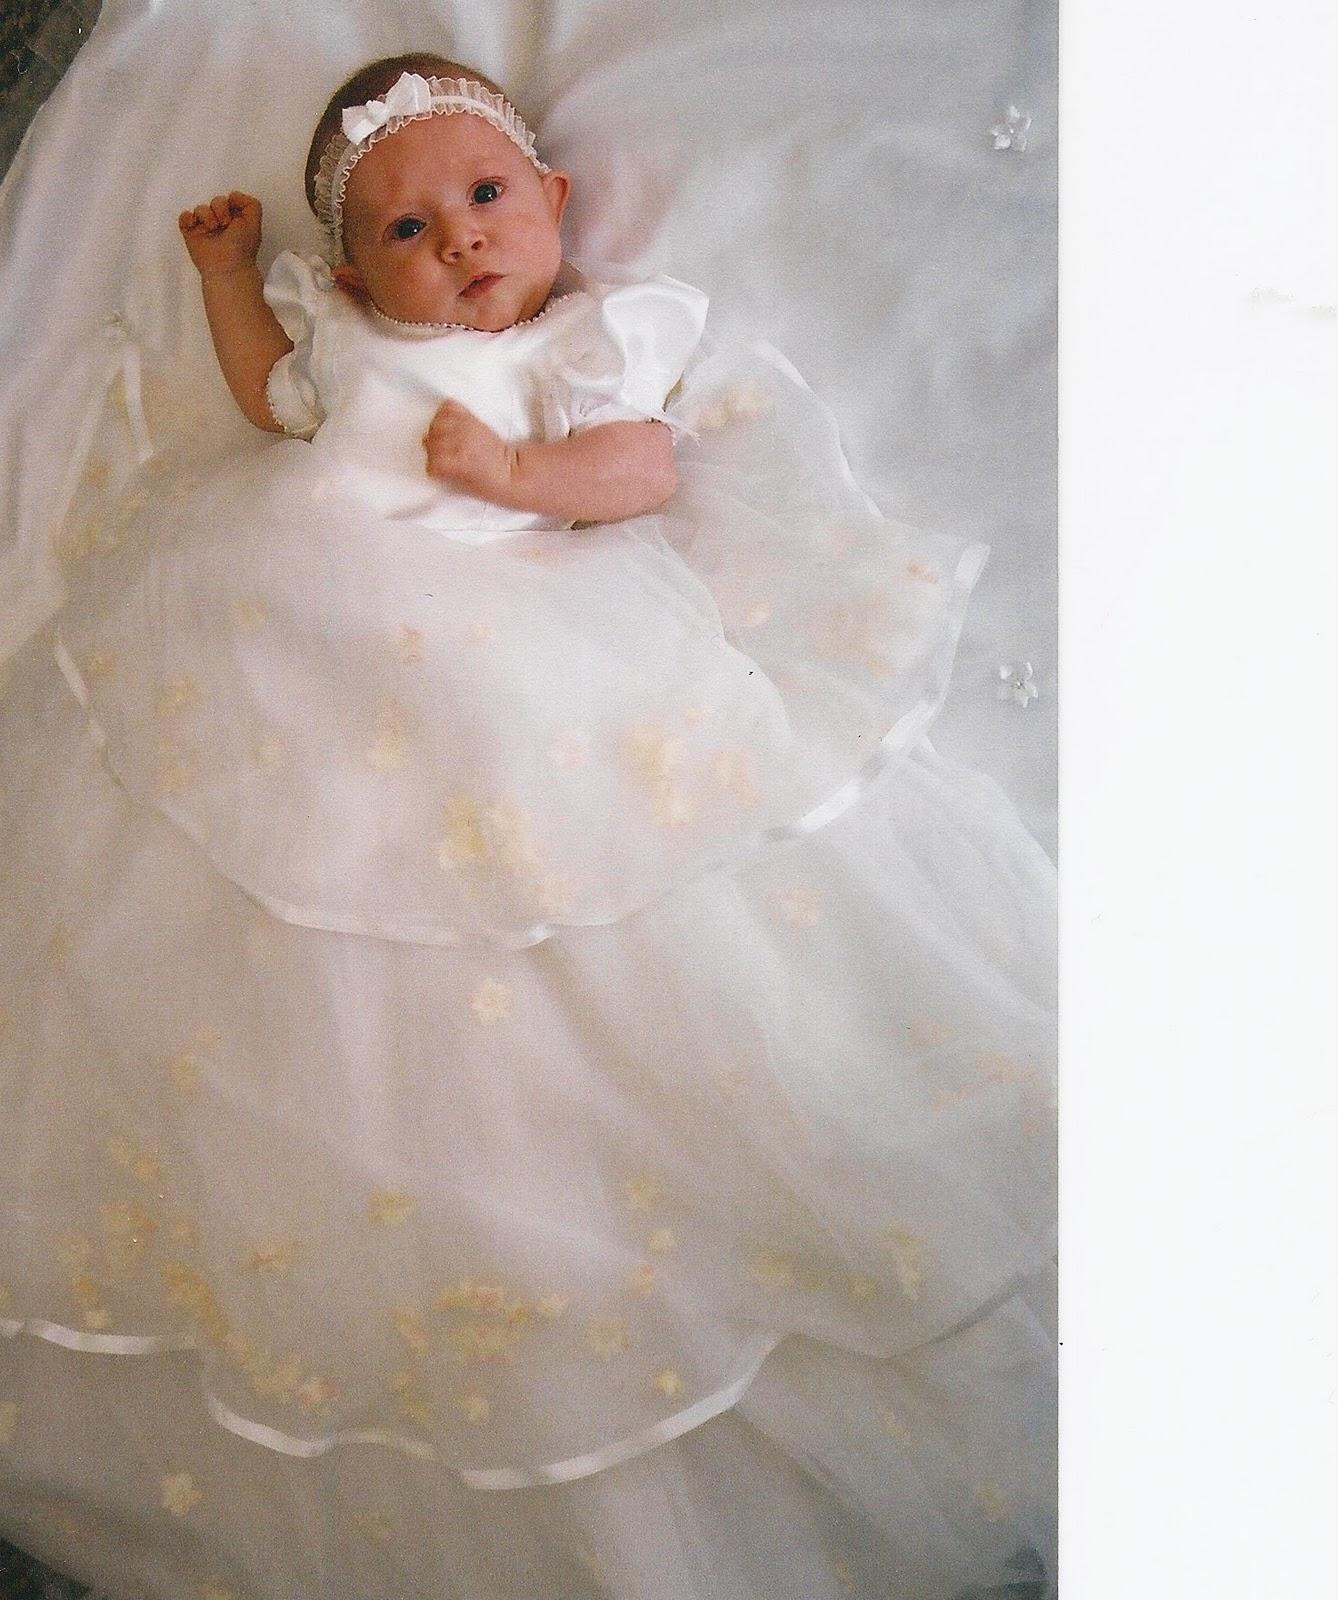 Sorensen Stuff The Story Of Her Three White Dresses